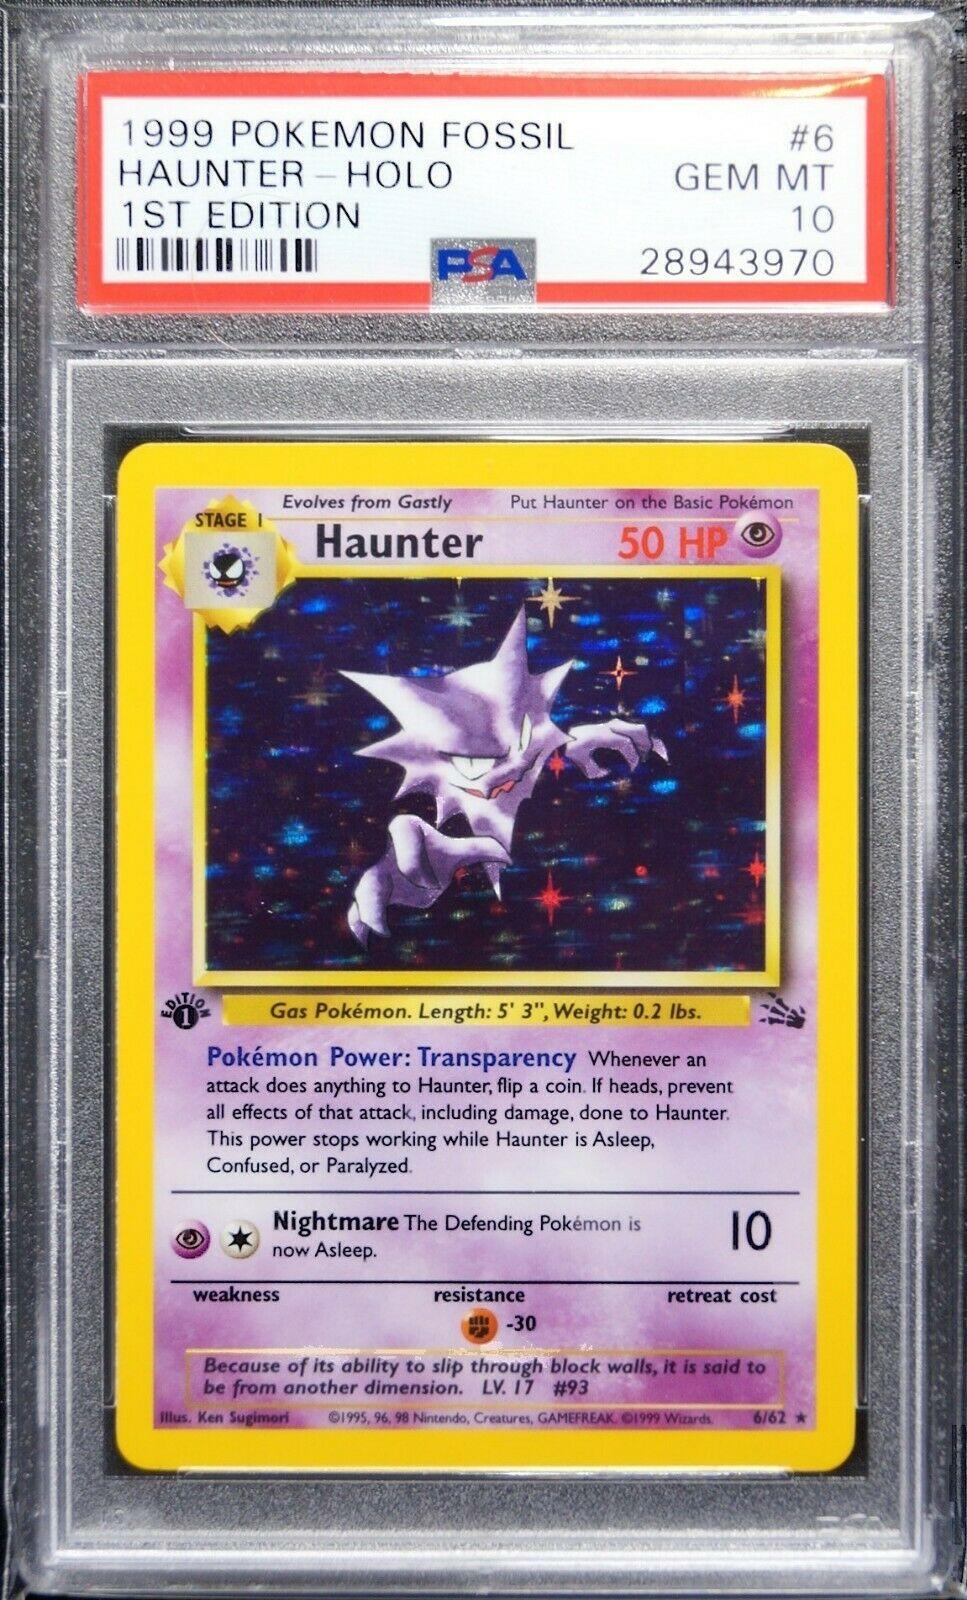 PSA 10 Gem Mint Haunter 1st edition Holo Fossil 1999 Pokemon Card 662